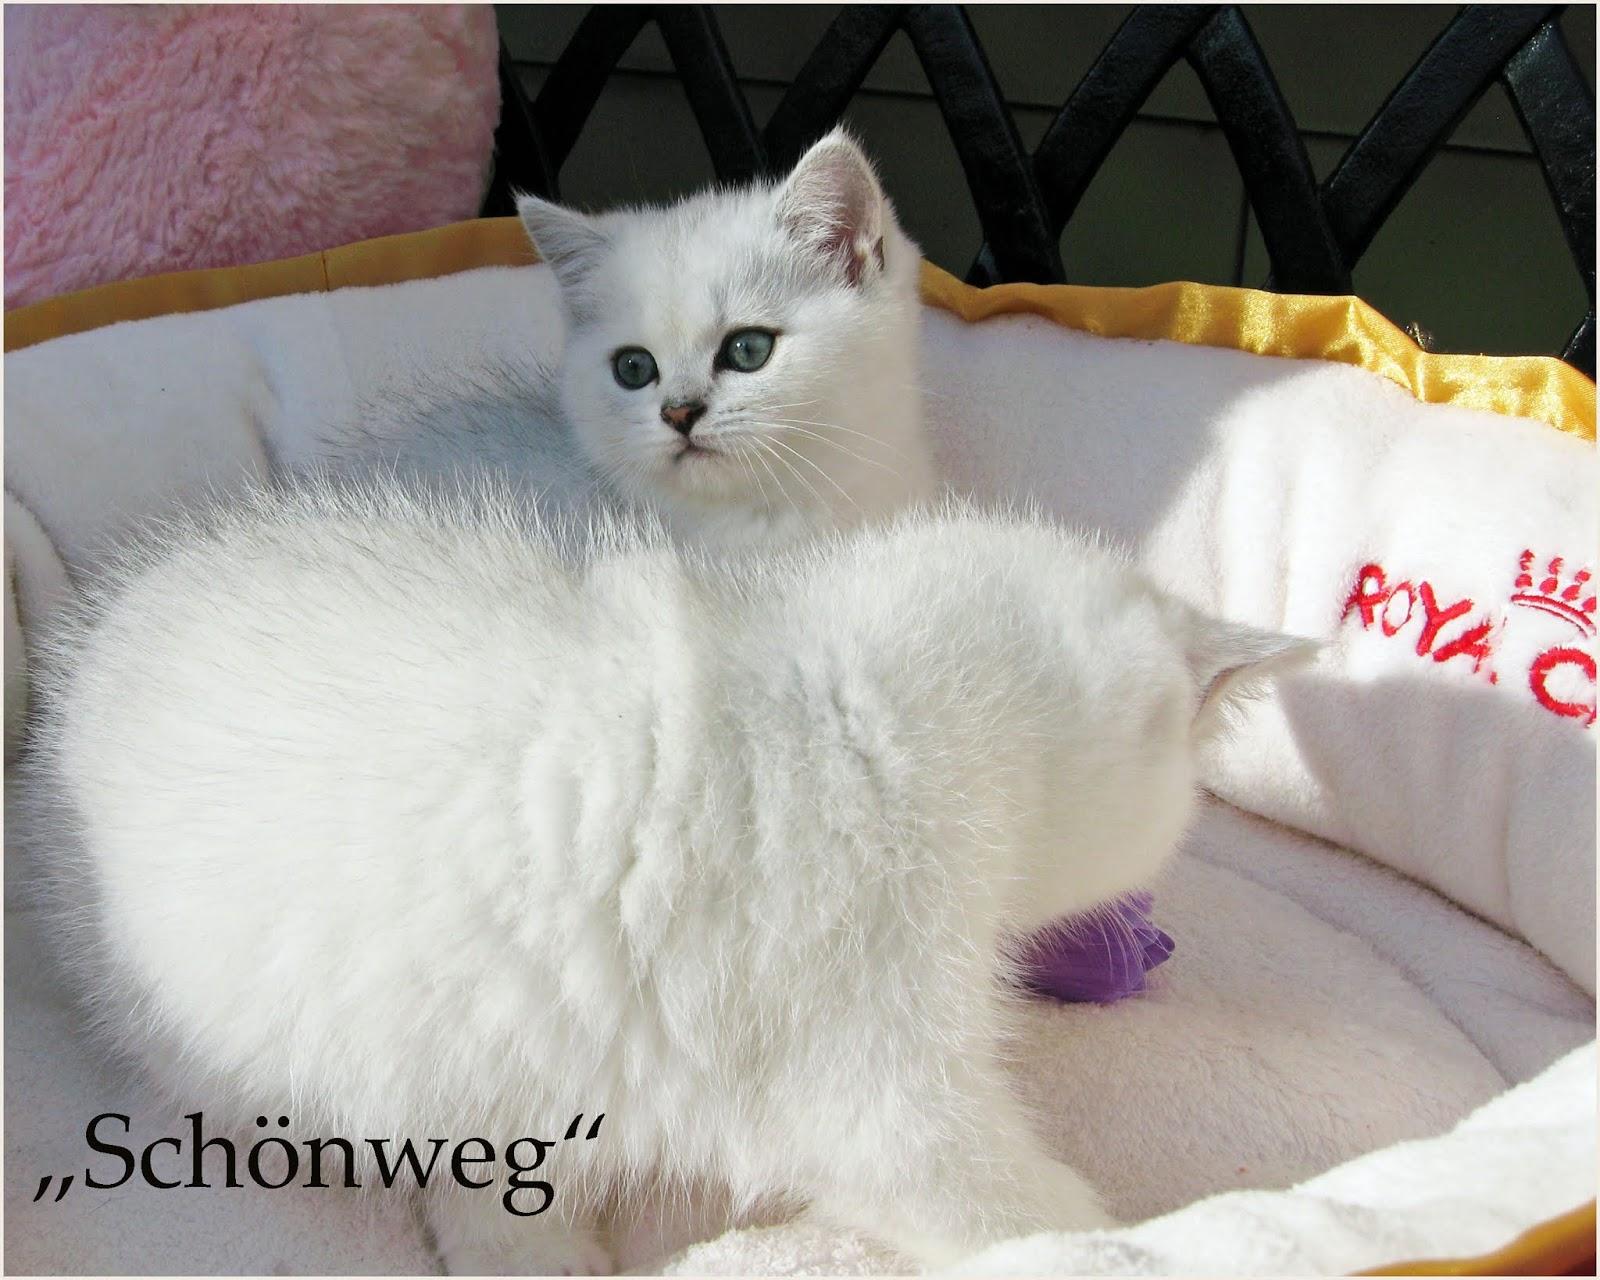 Schoenweg Chinchilla Cats Cattery